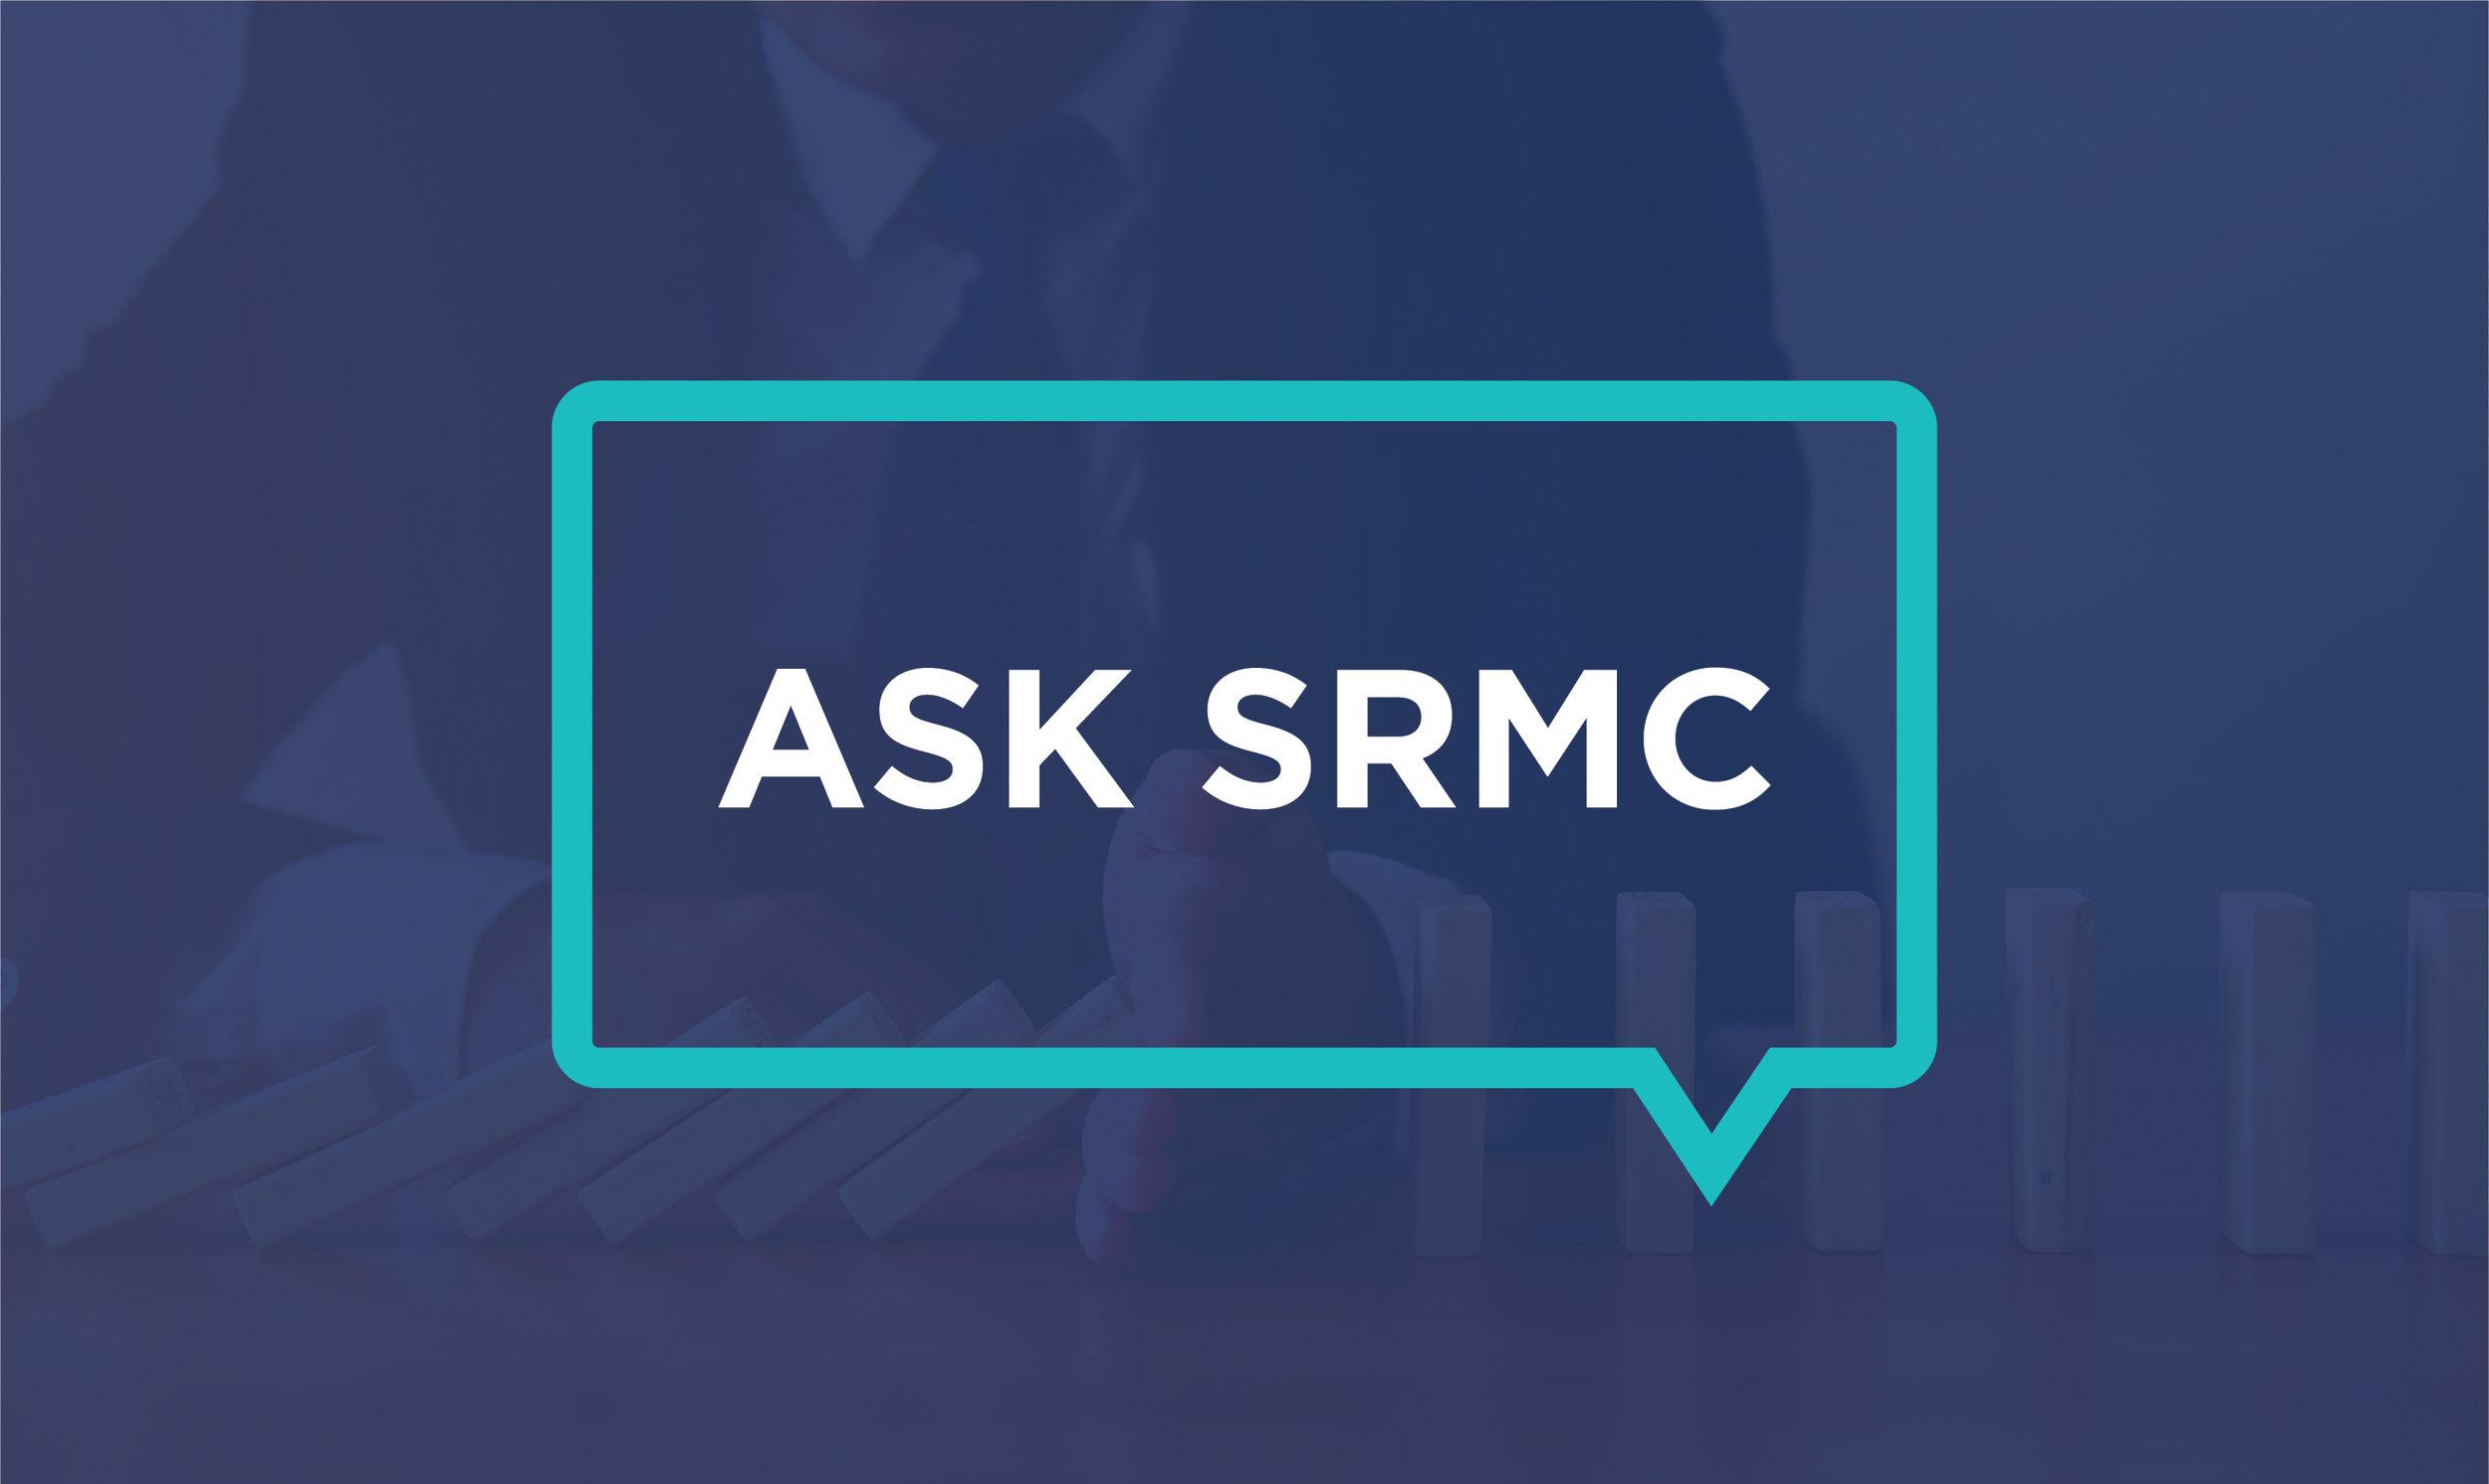 ask-srmc.jpg